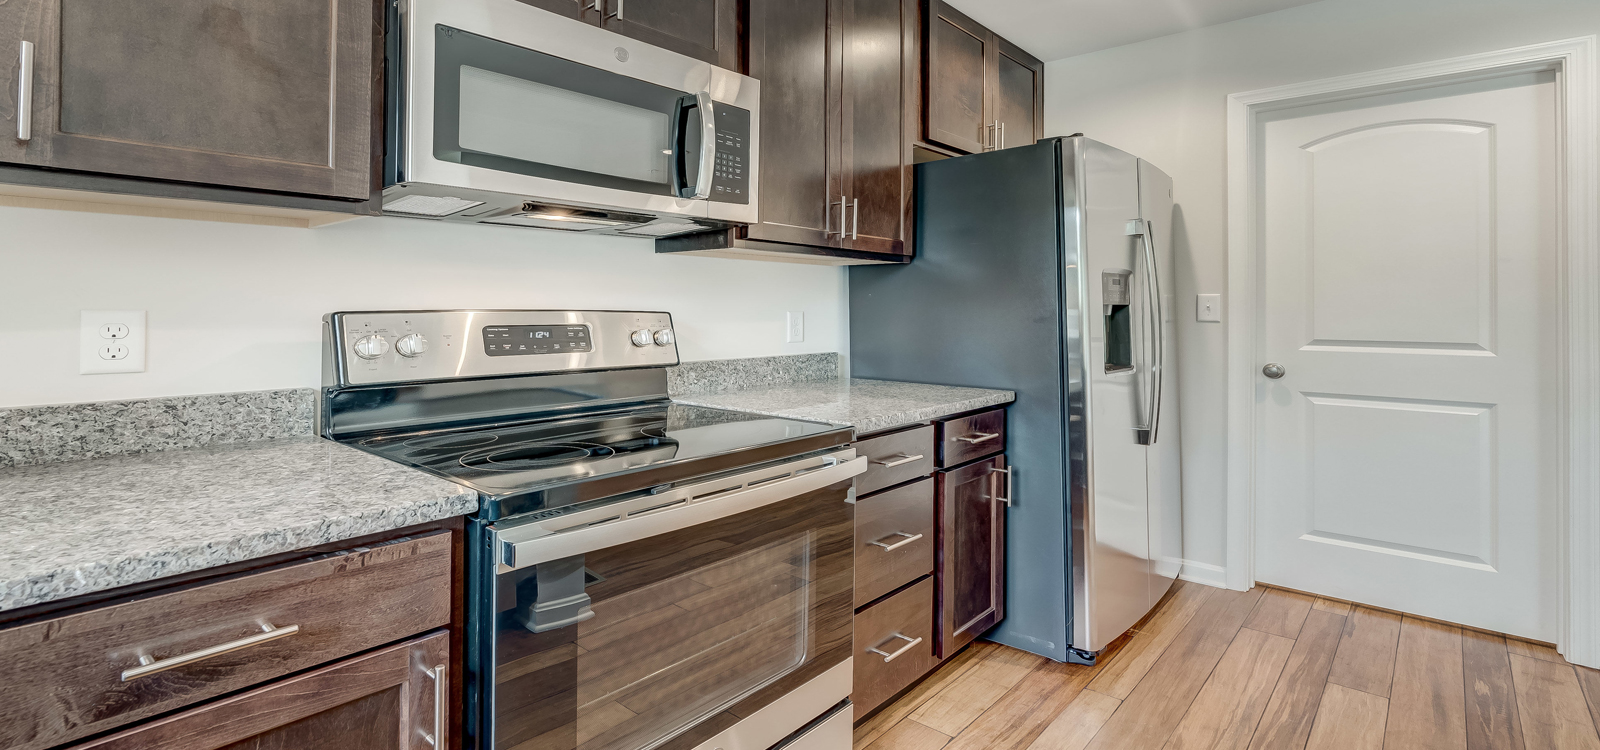 Palmer Park Meadows affordable housing by UrbanBuilt